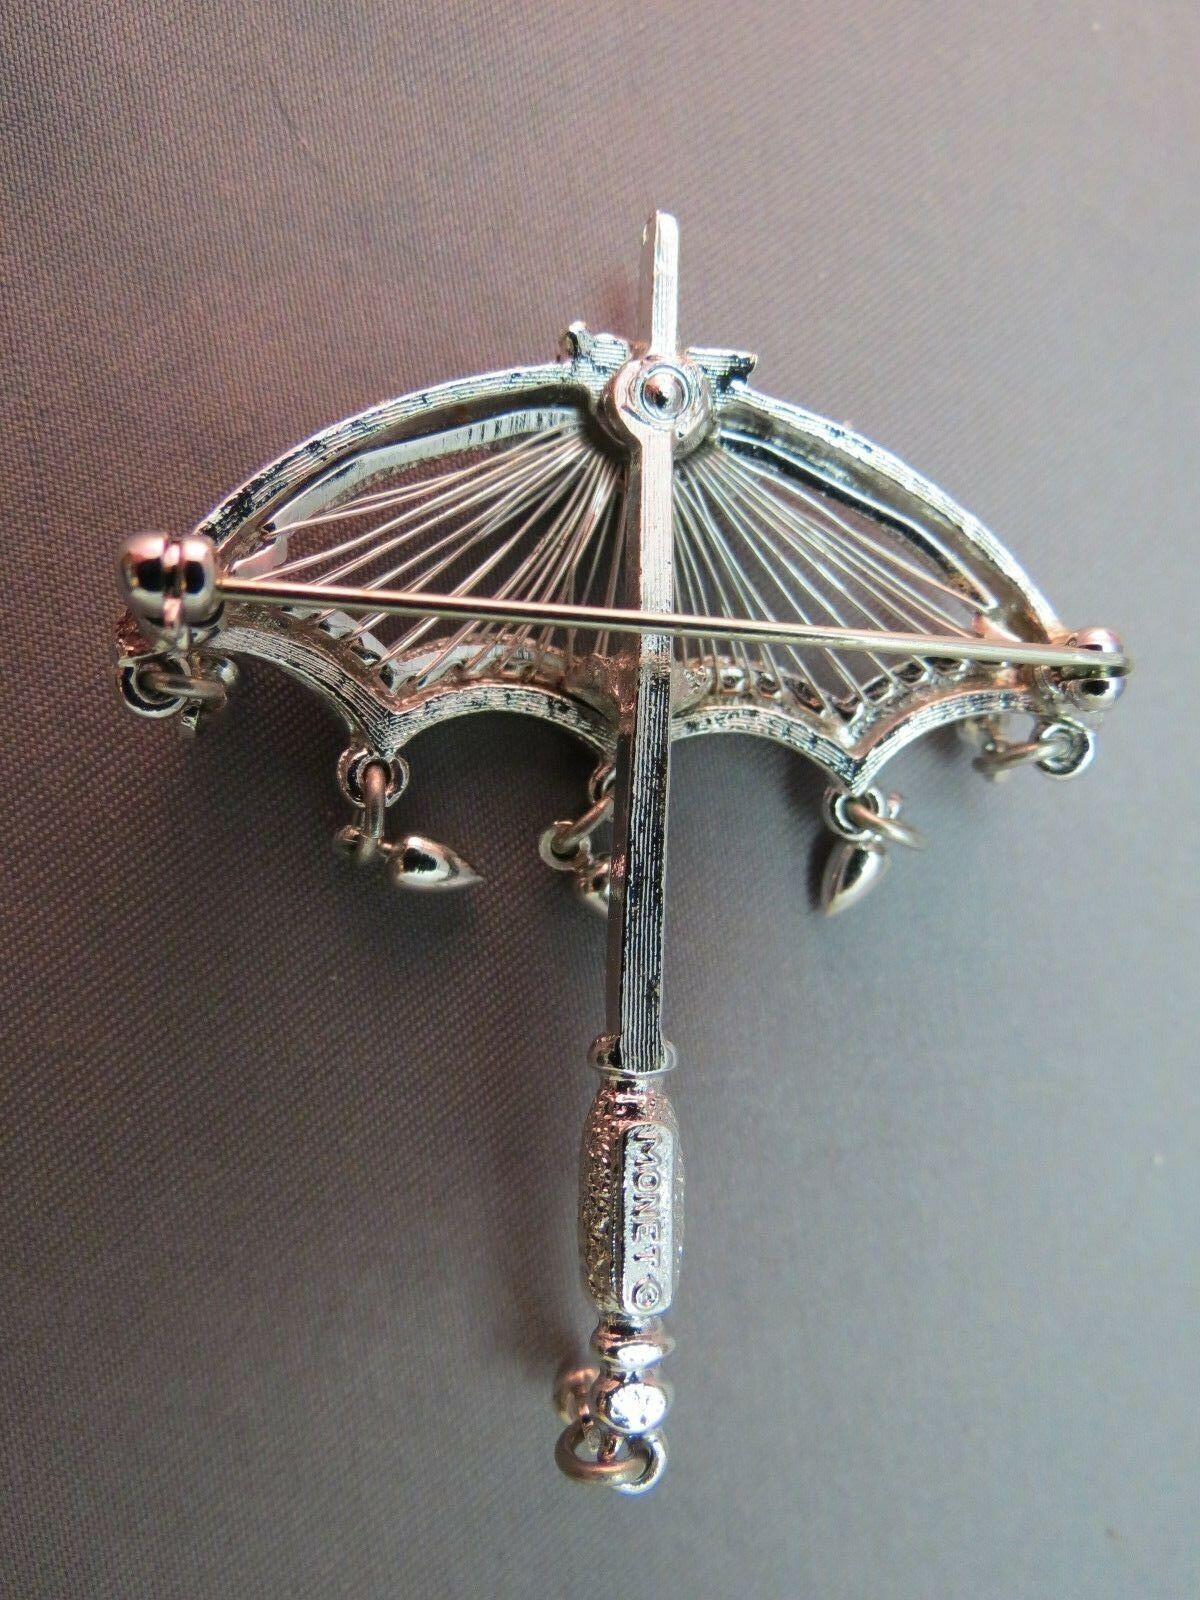 Vintage Monet Umbrella Brooch Rain Drop Dangles Brooch Rare Silver Finish NICE